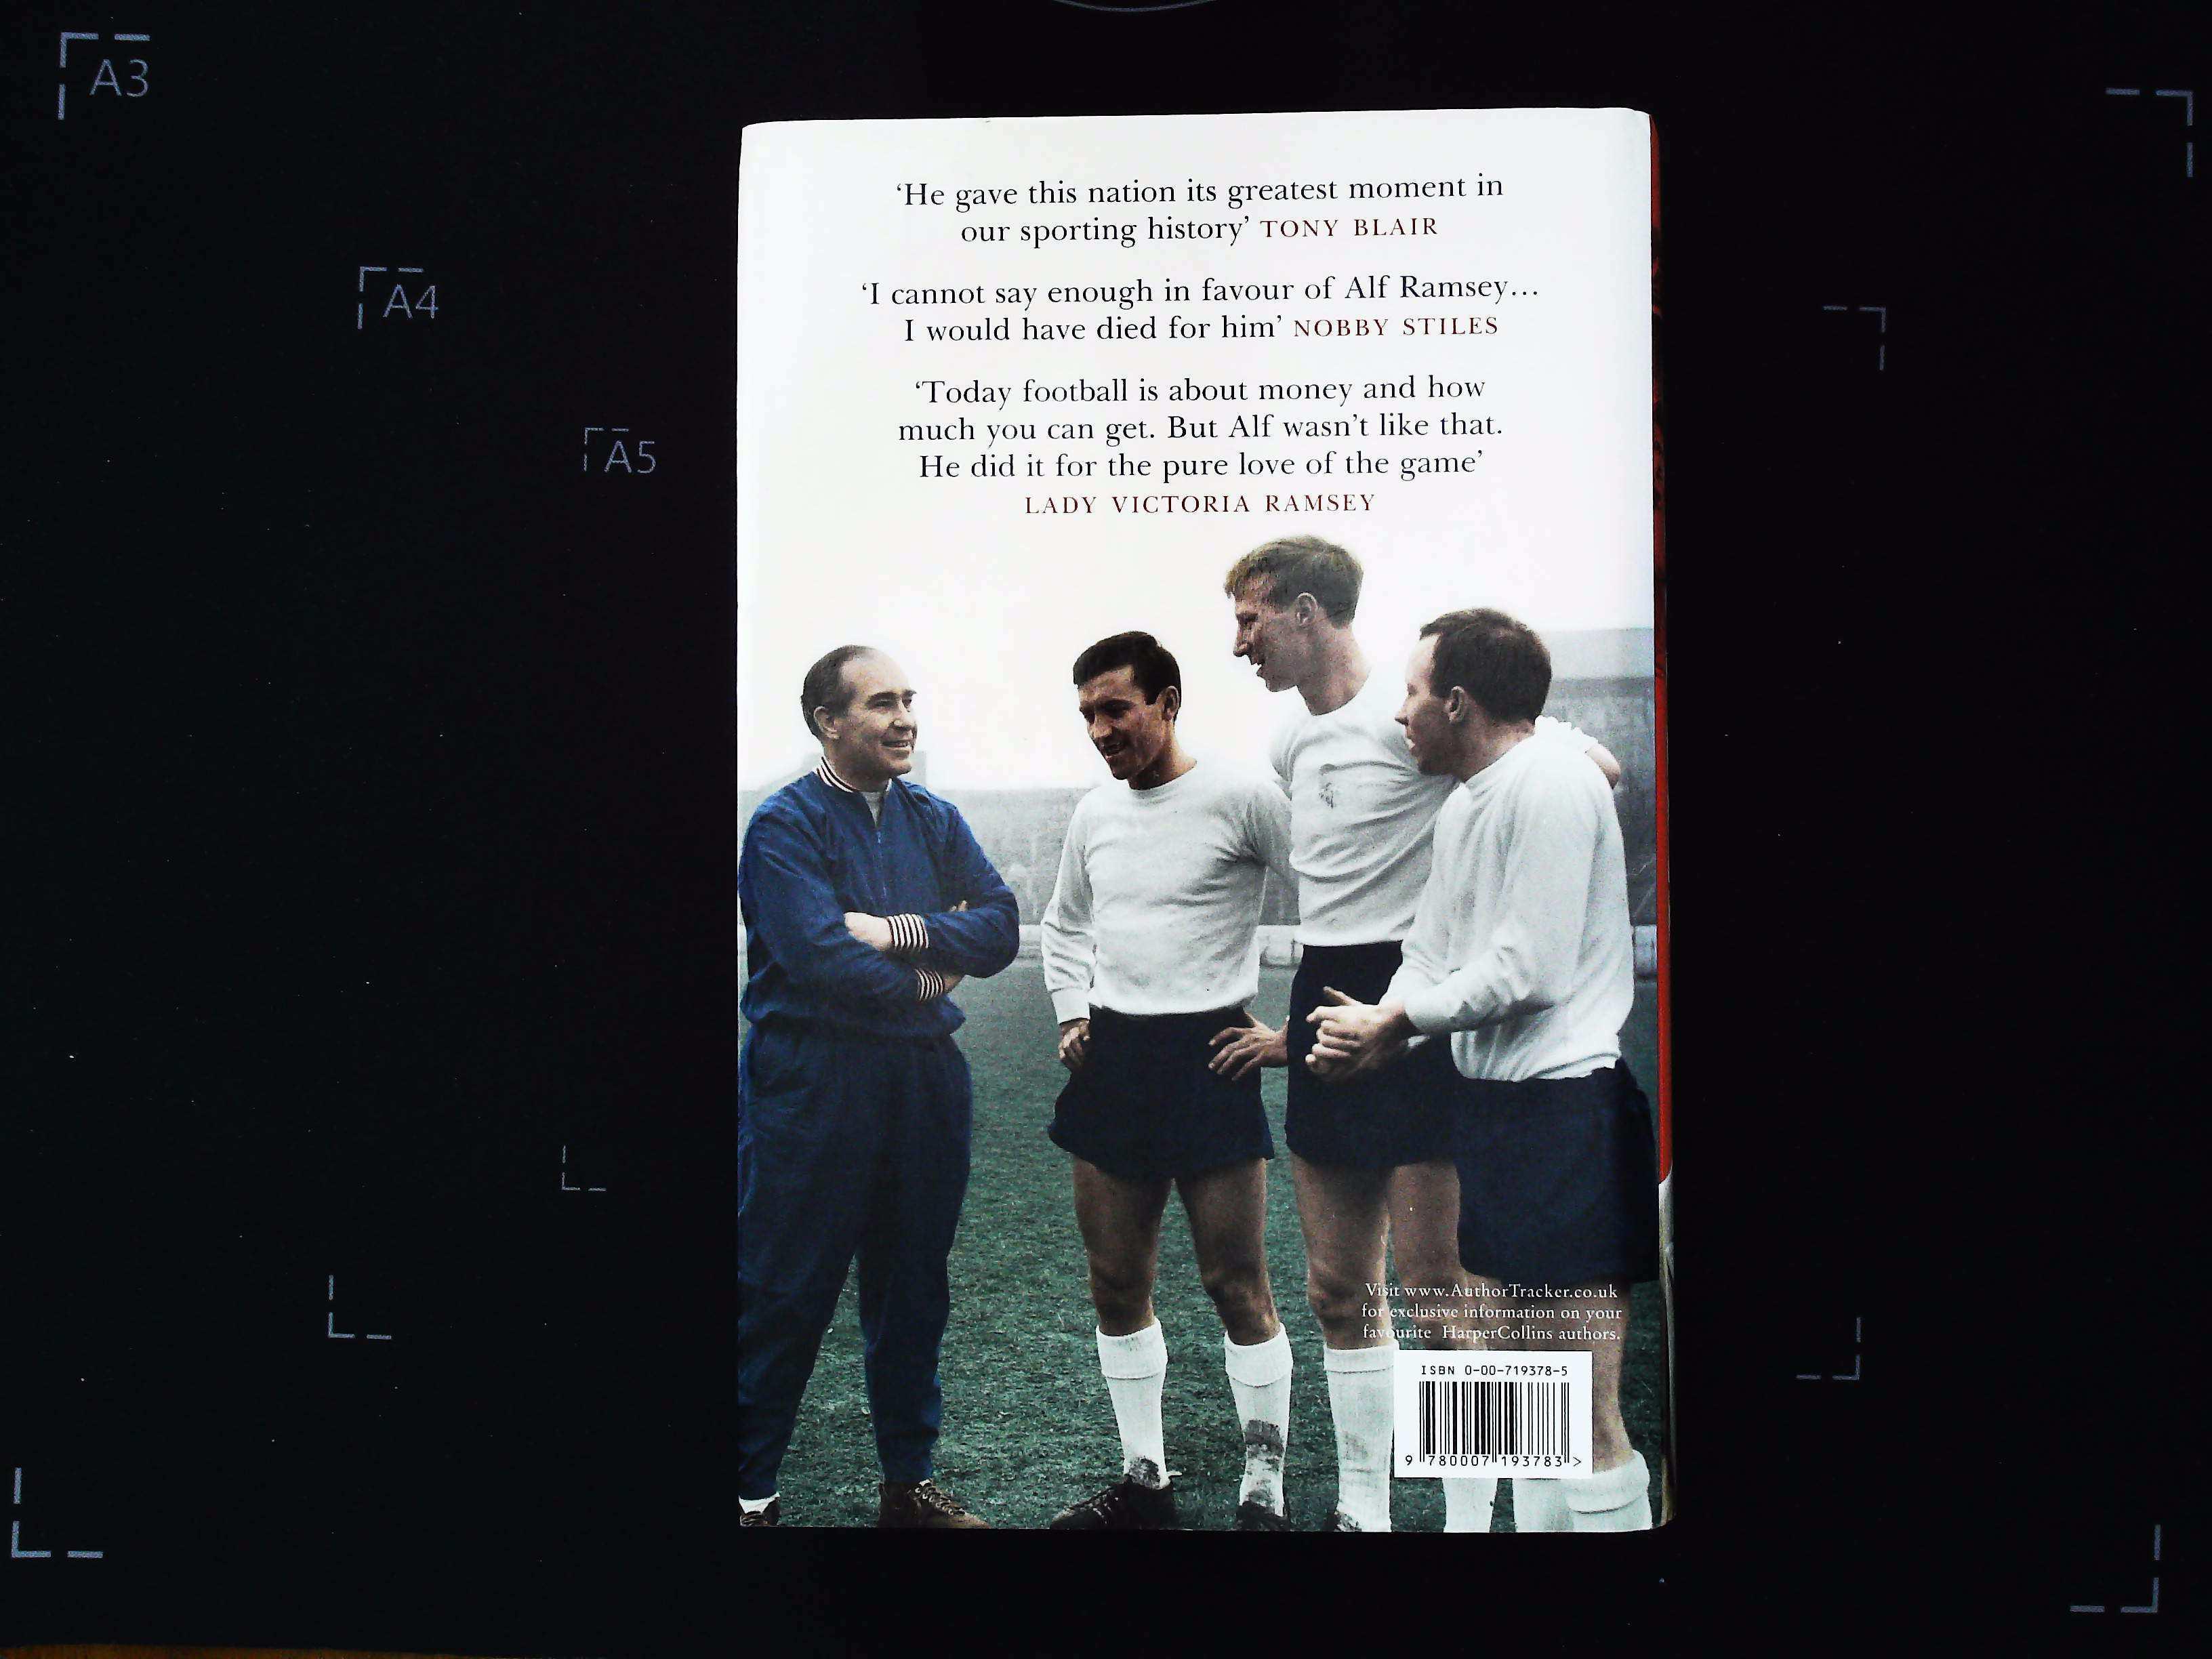 Sir Alf hardback book by Leo McKinstry. Published 2006 Harpersport. ISBN 0-00-719378-5. 528 pages. - Image 2 of 3